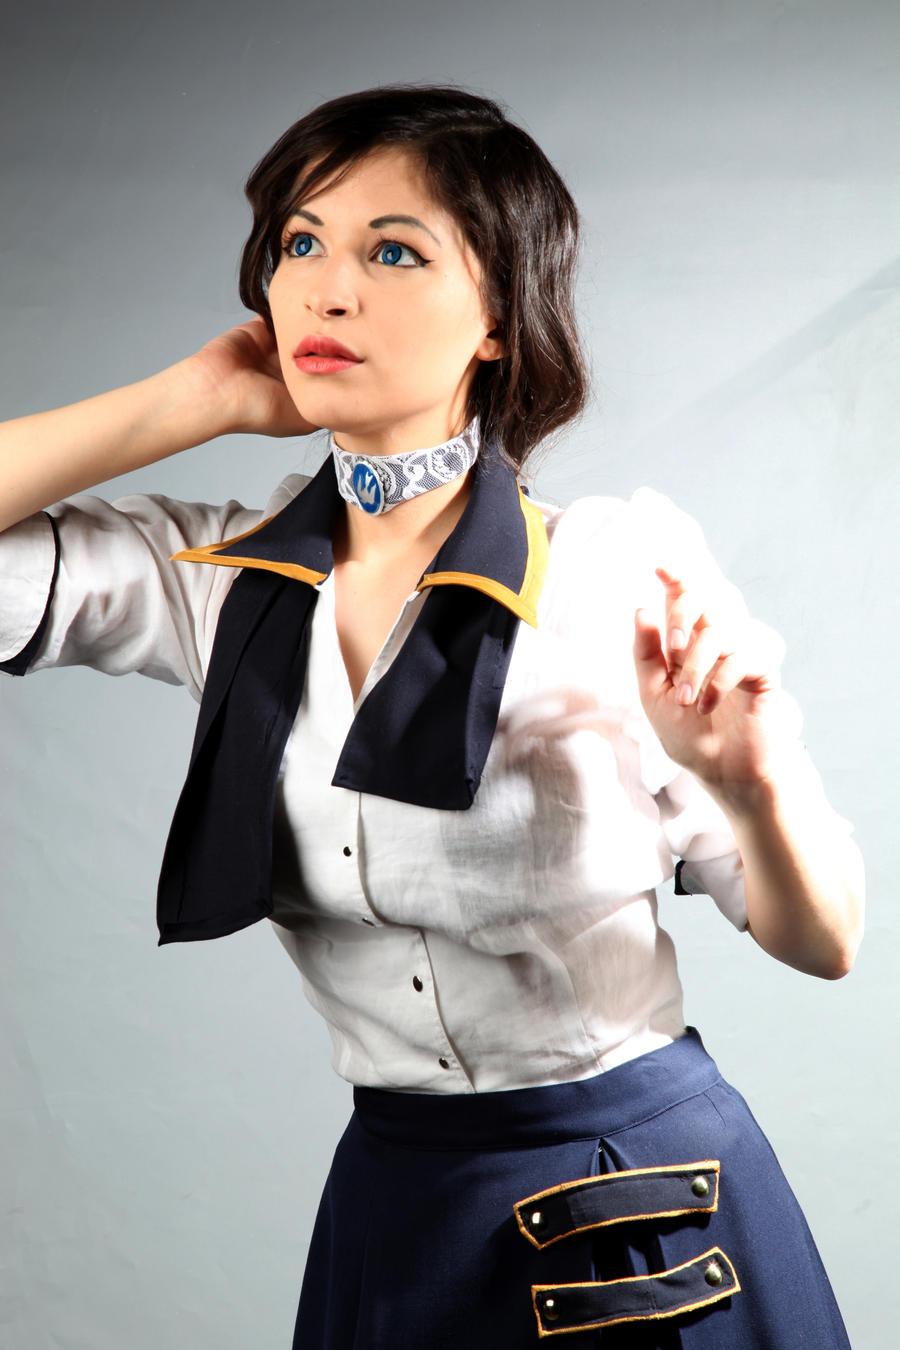 Bioshock Infinite - Elizabeth Cosplay by Aicosu